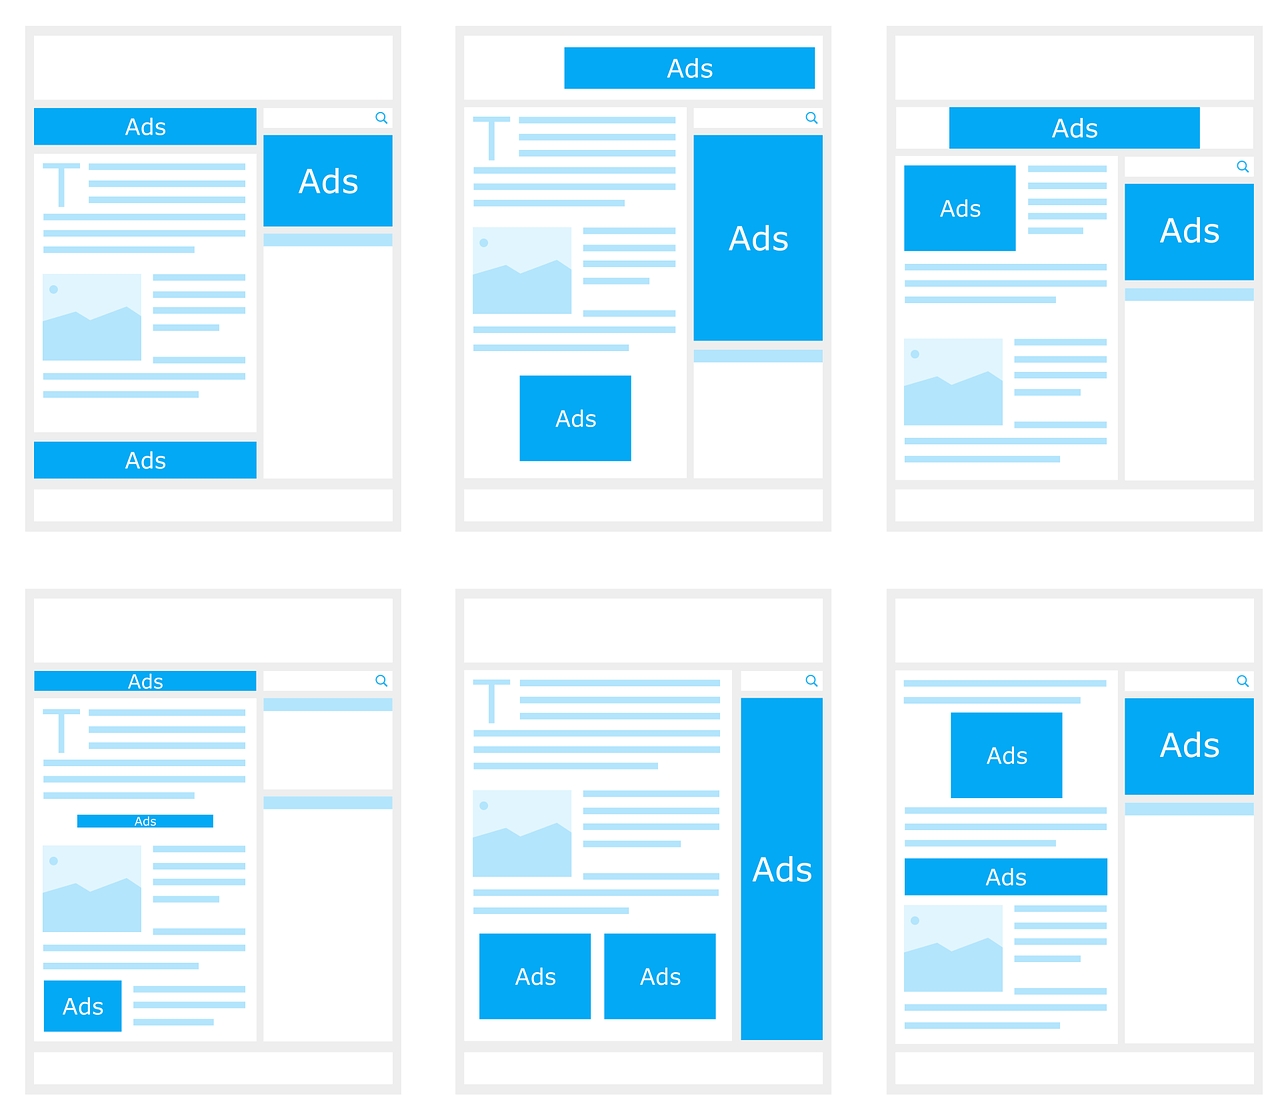 advertisment-webiste-layout